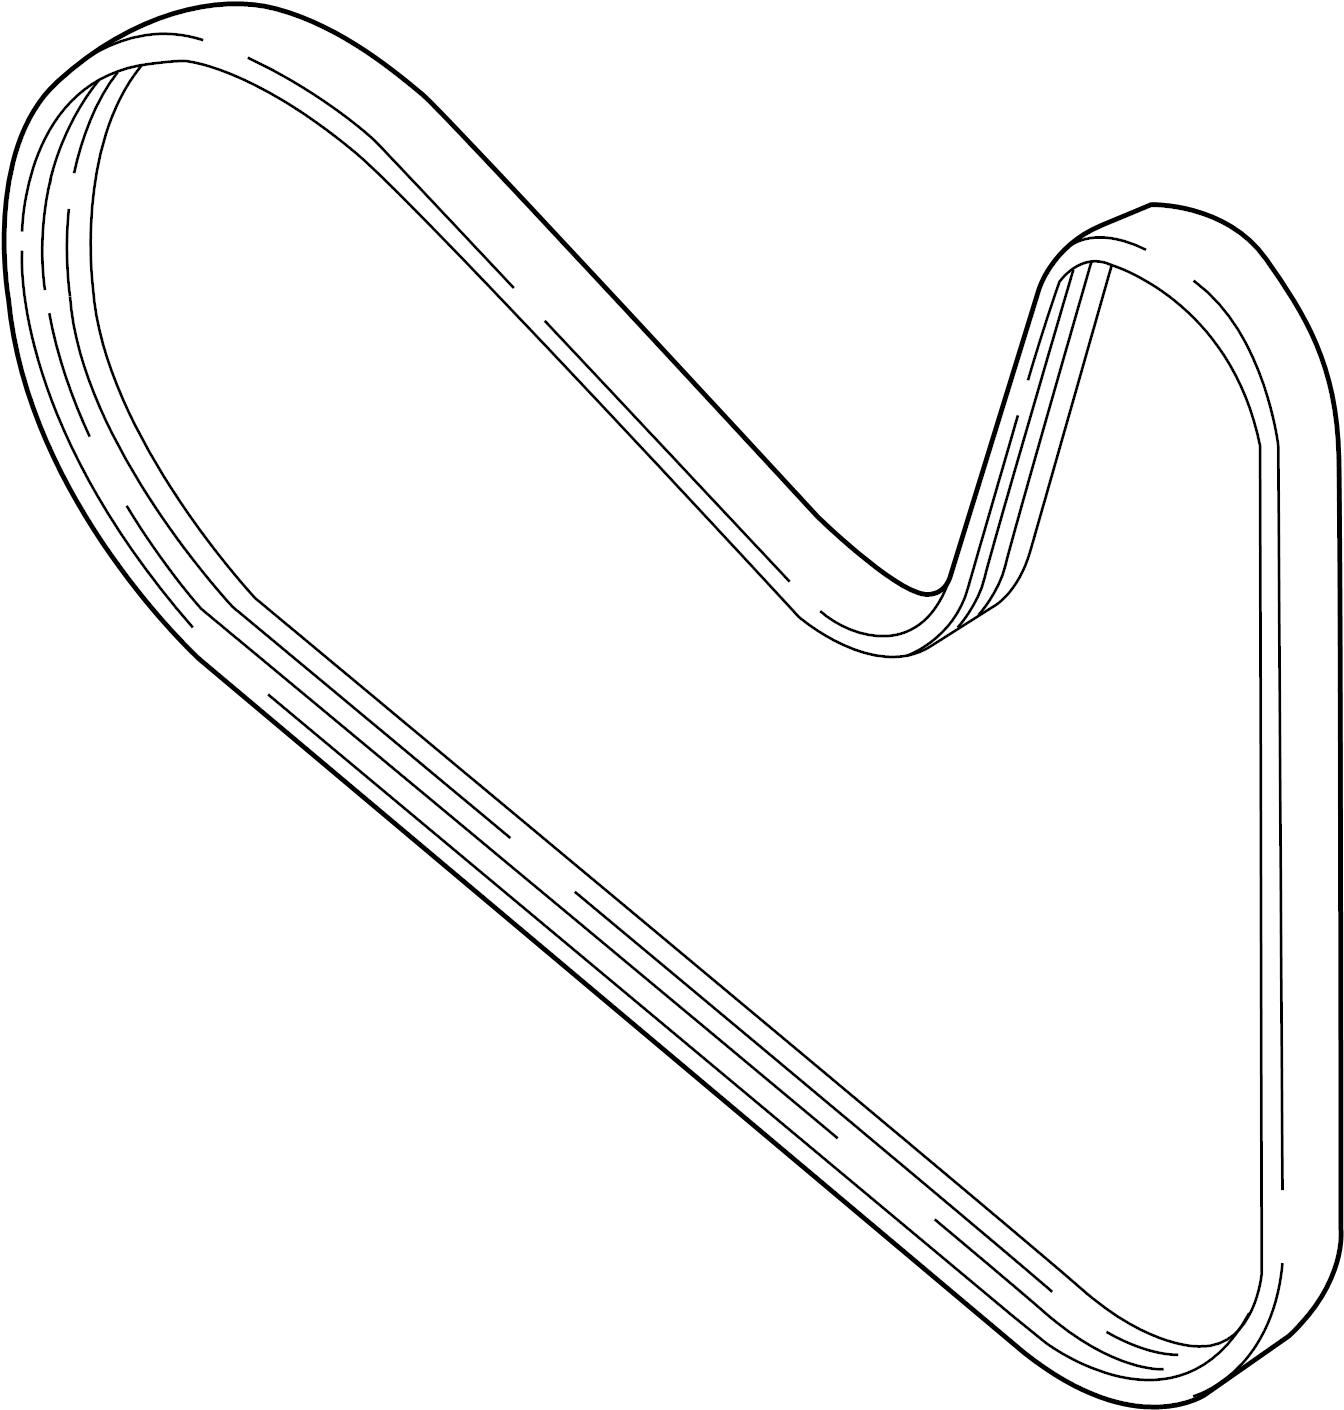 Volkswagen Jetta Ribbedbelt Serpentine Beltsel